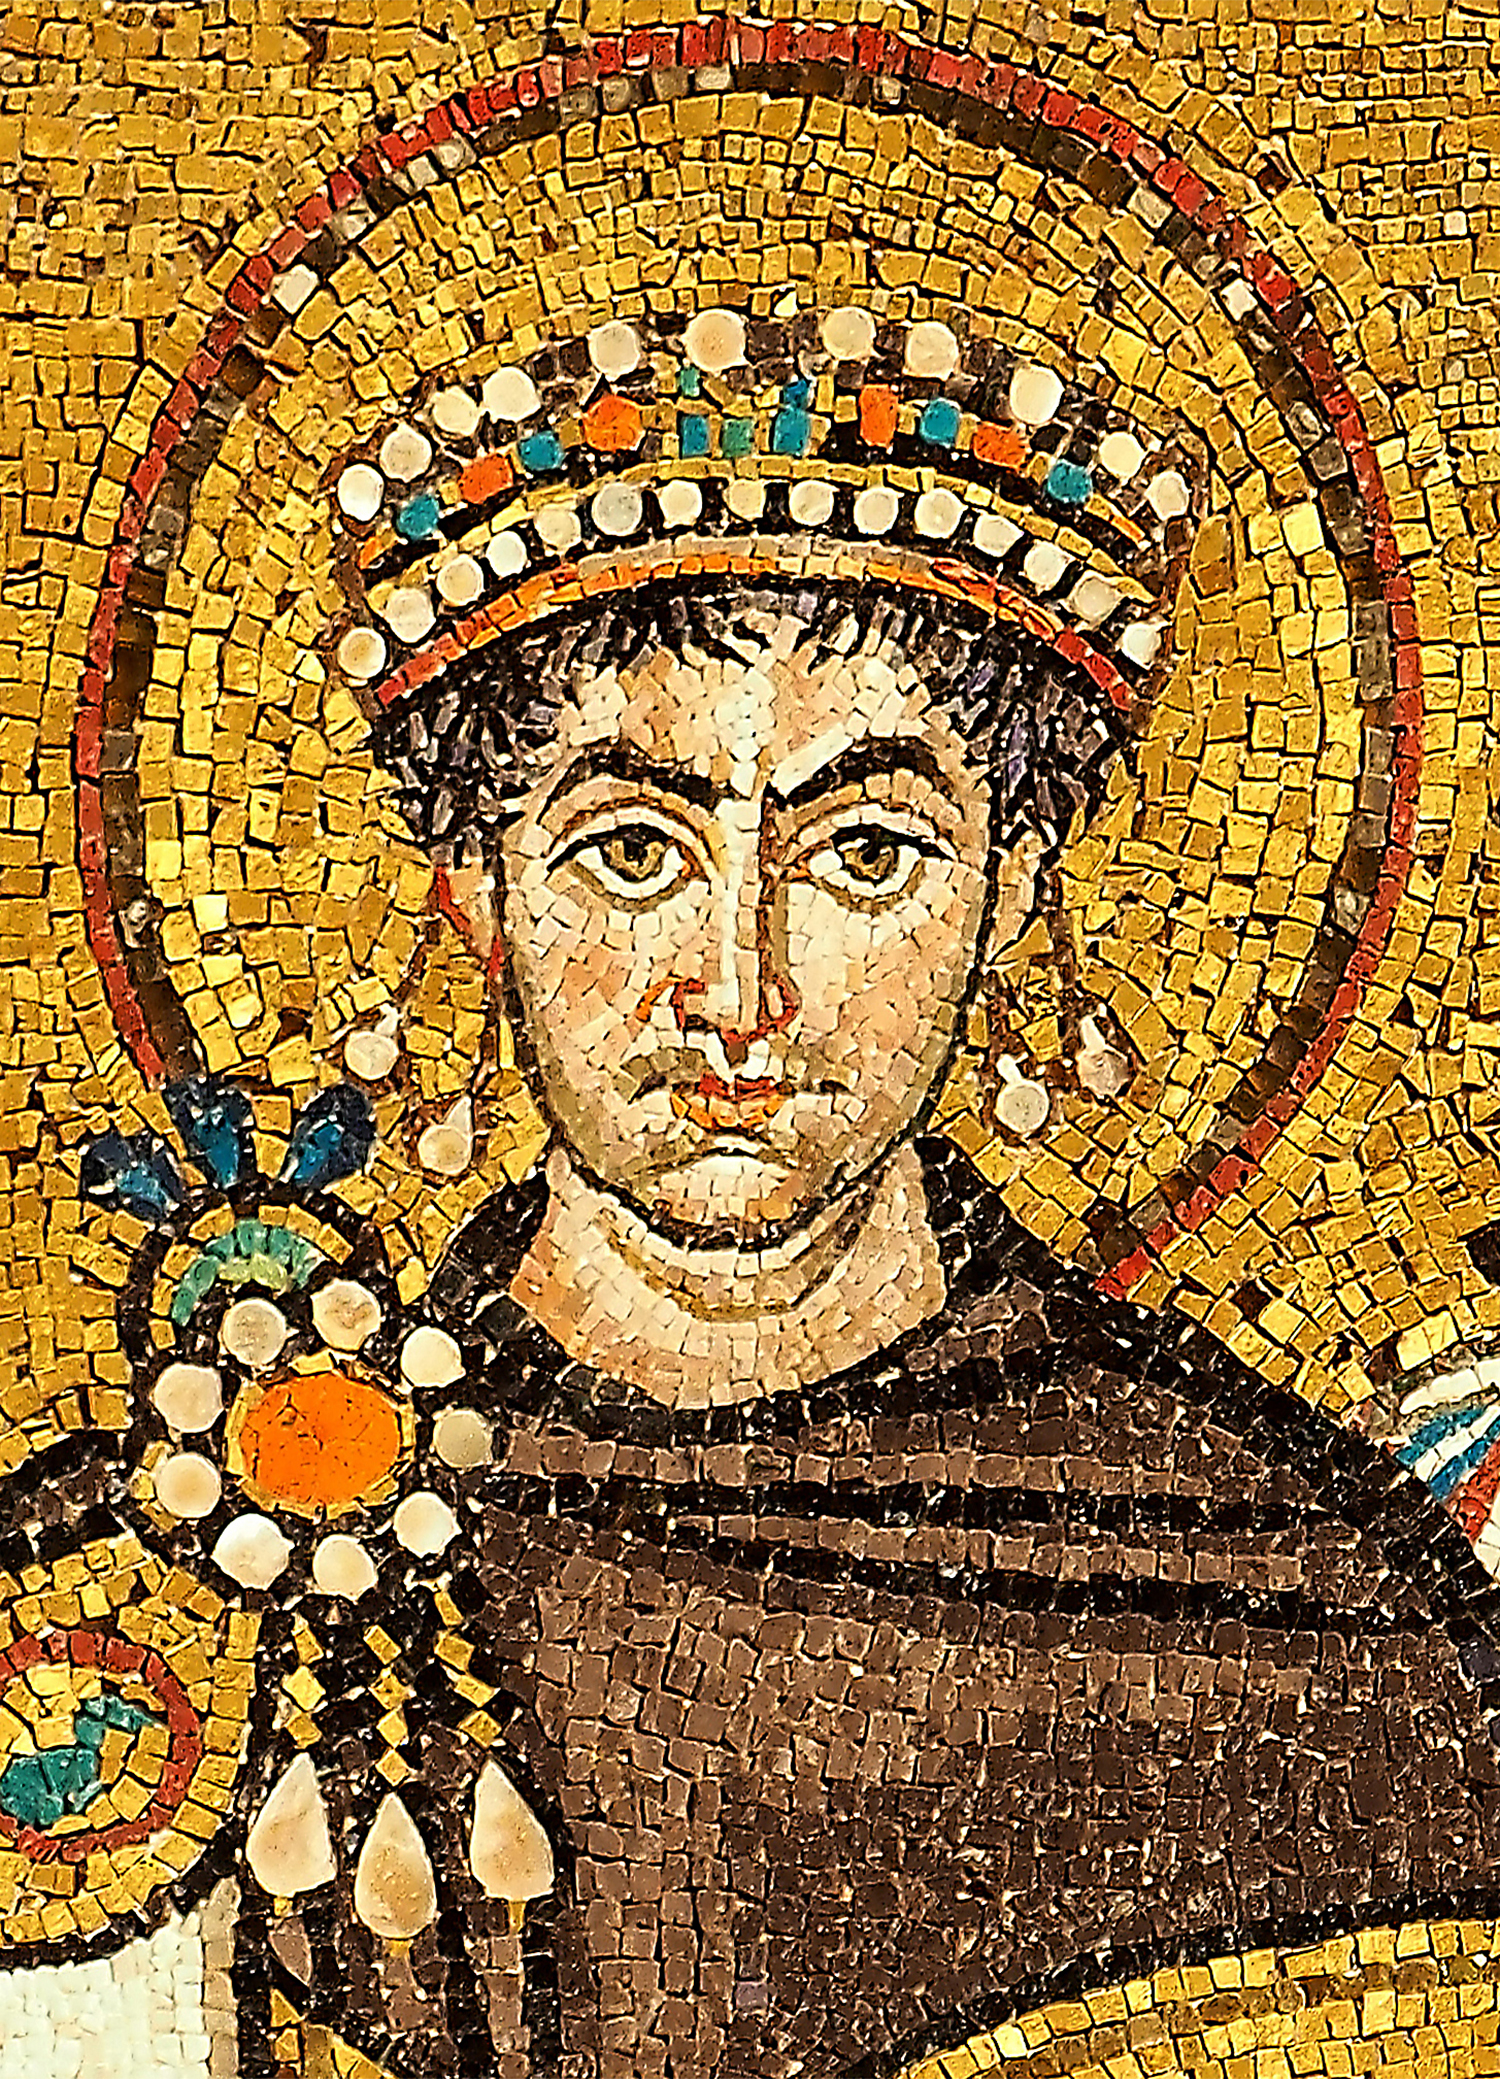 Construction of the new Hagia Sophia